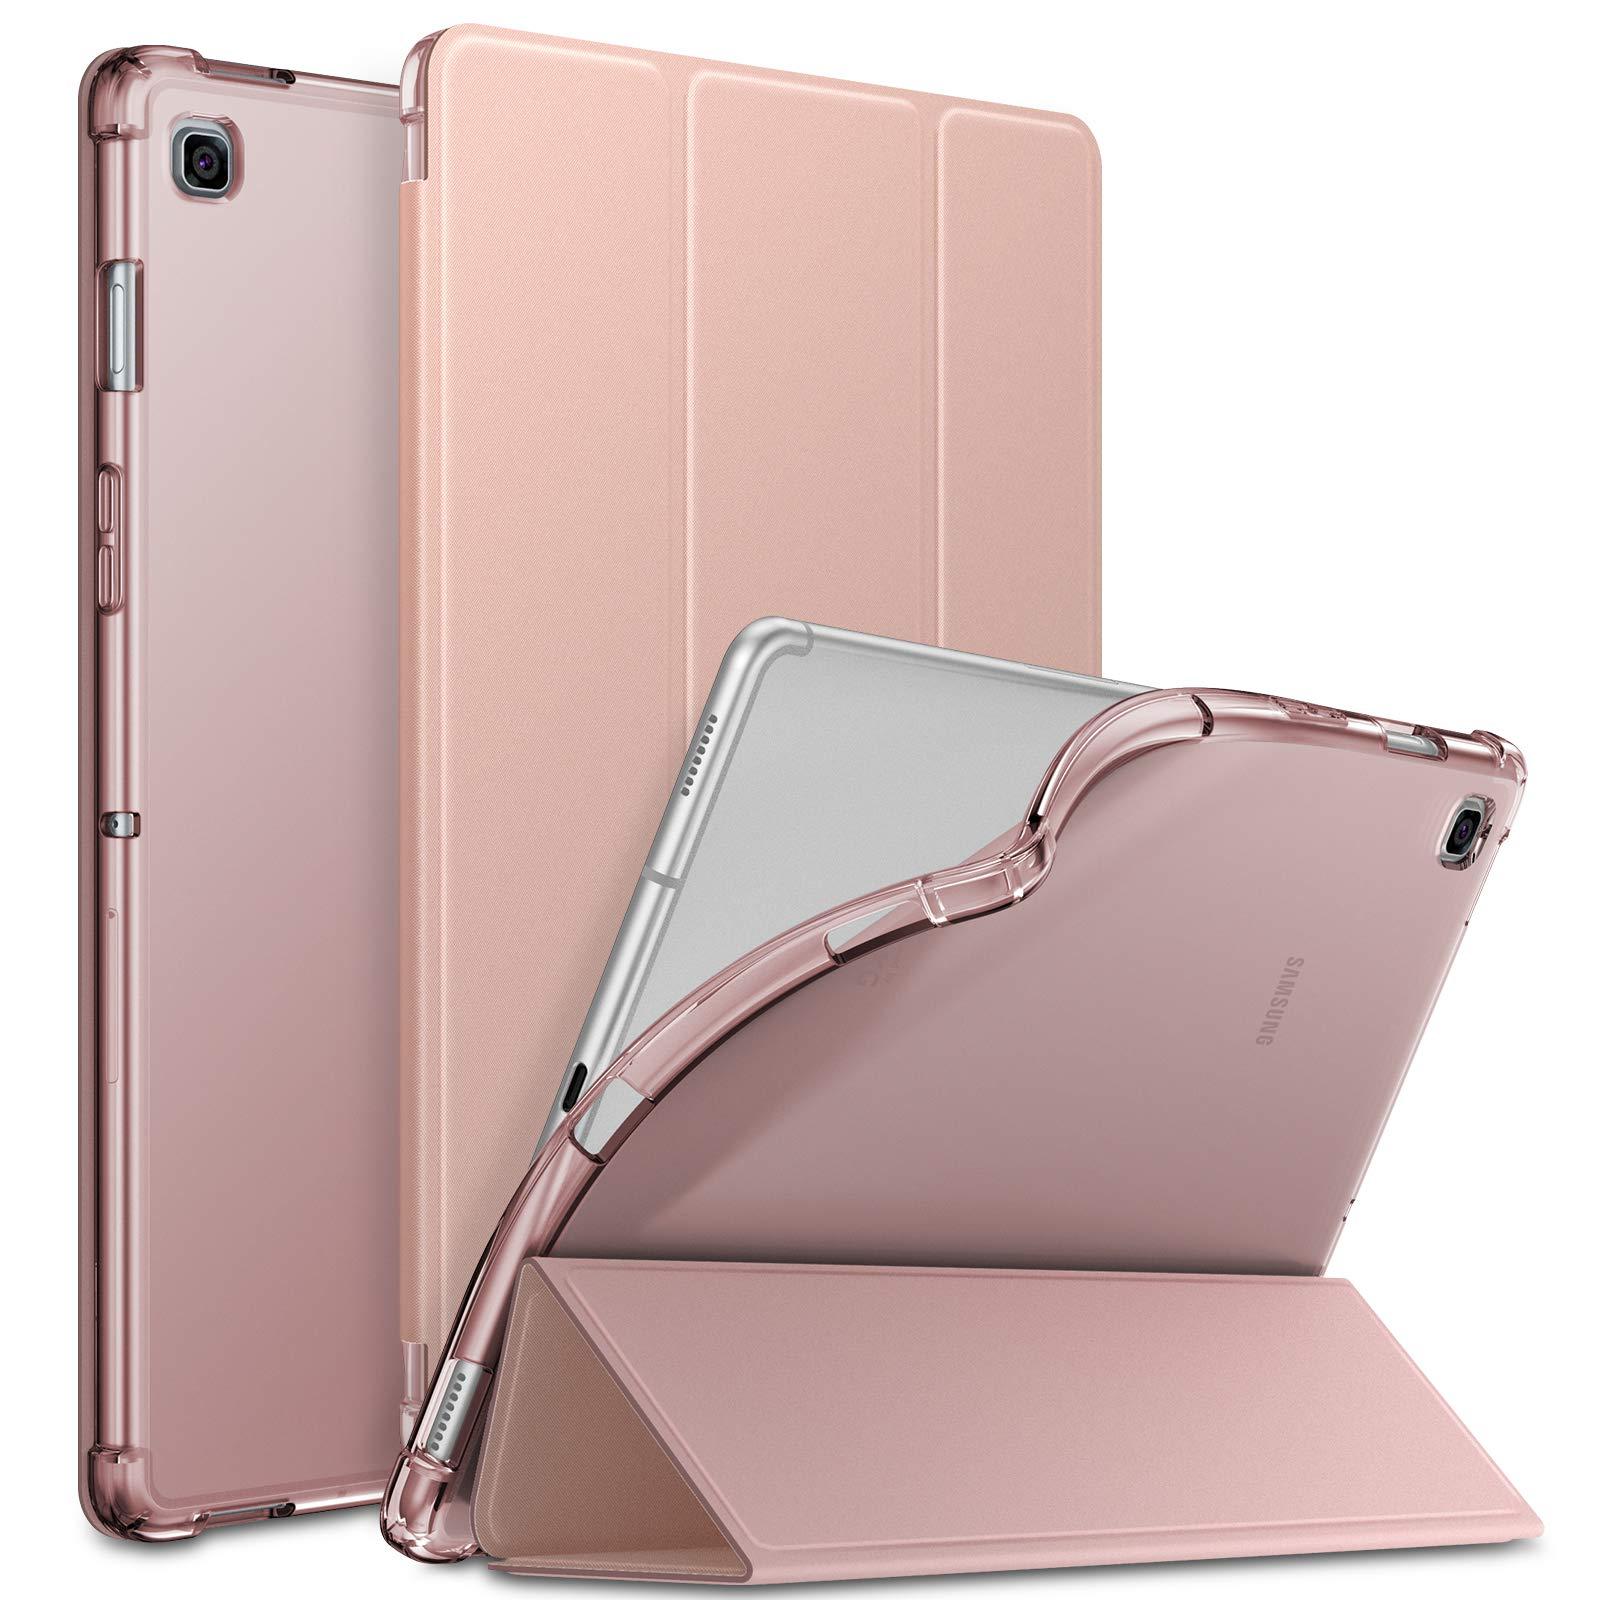 Funda Samsung Galaxy Tab S5e INFILAND [7S8G2XCF]